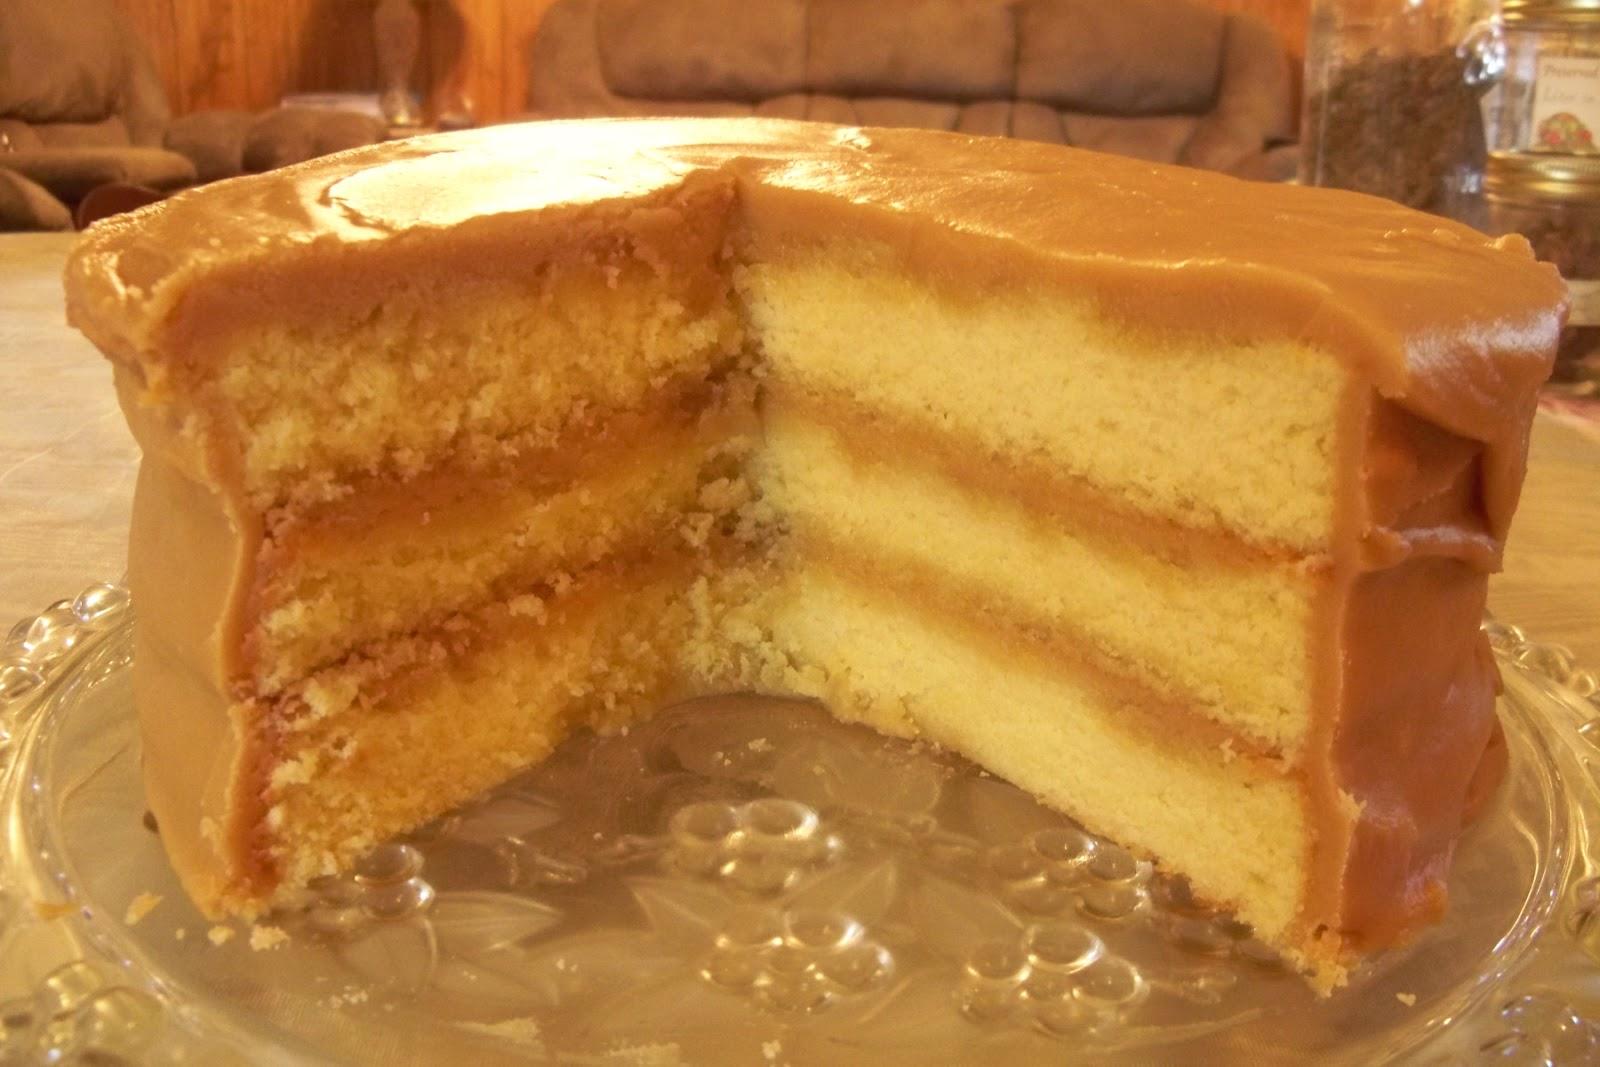 Caramel Cake dcarrier1021